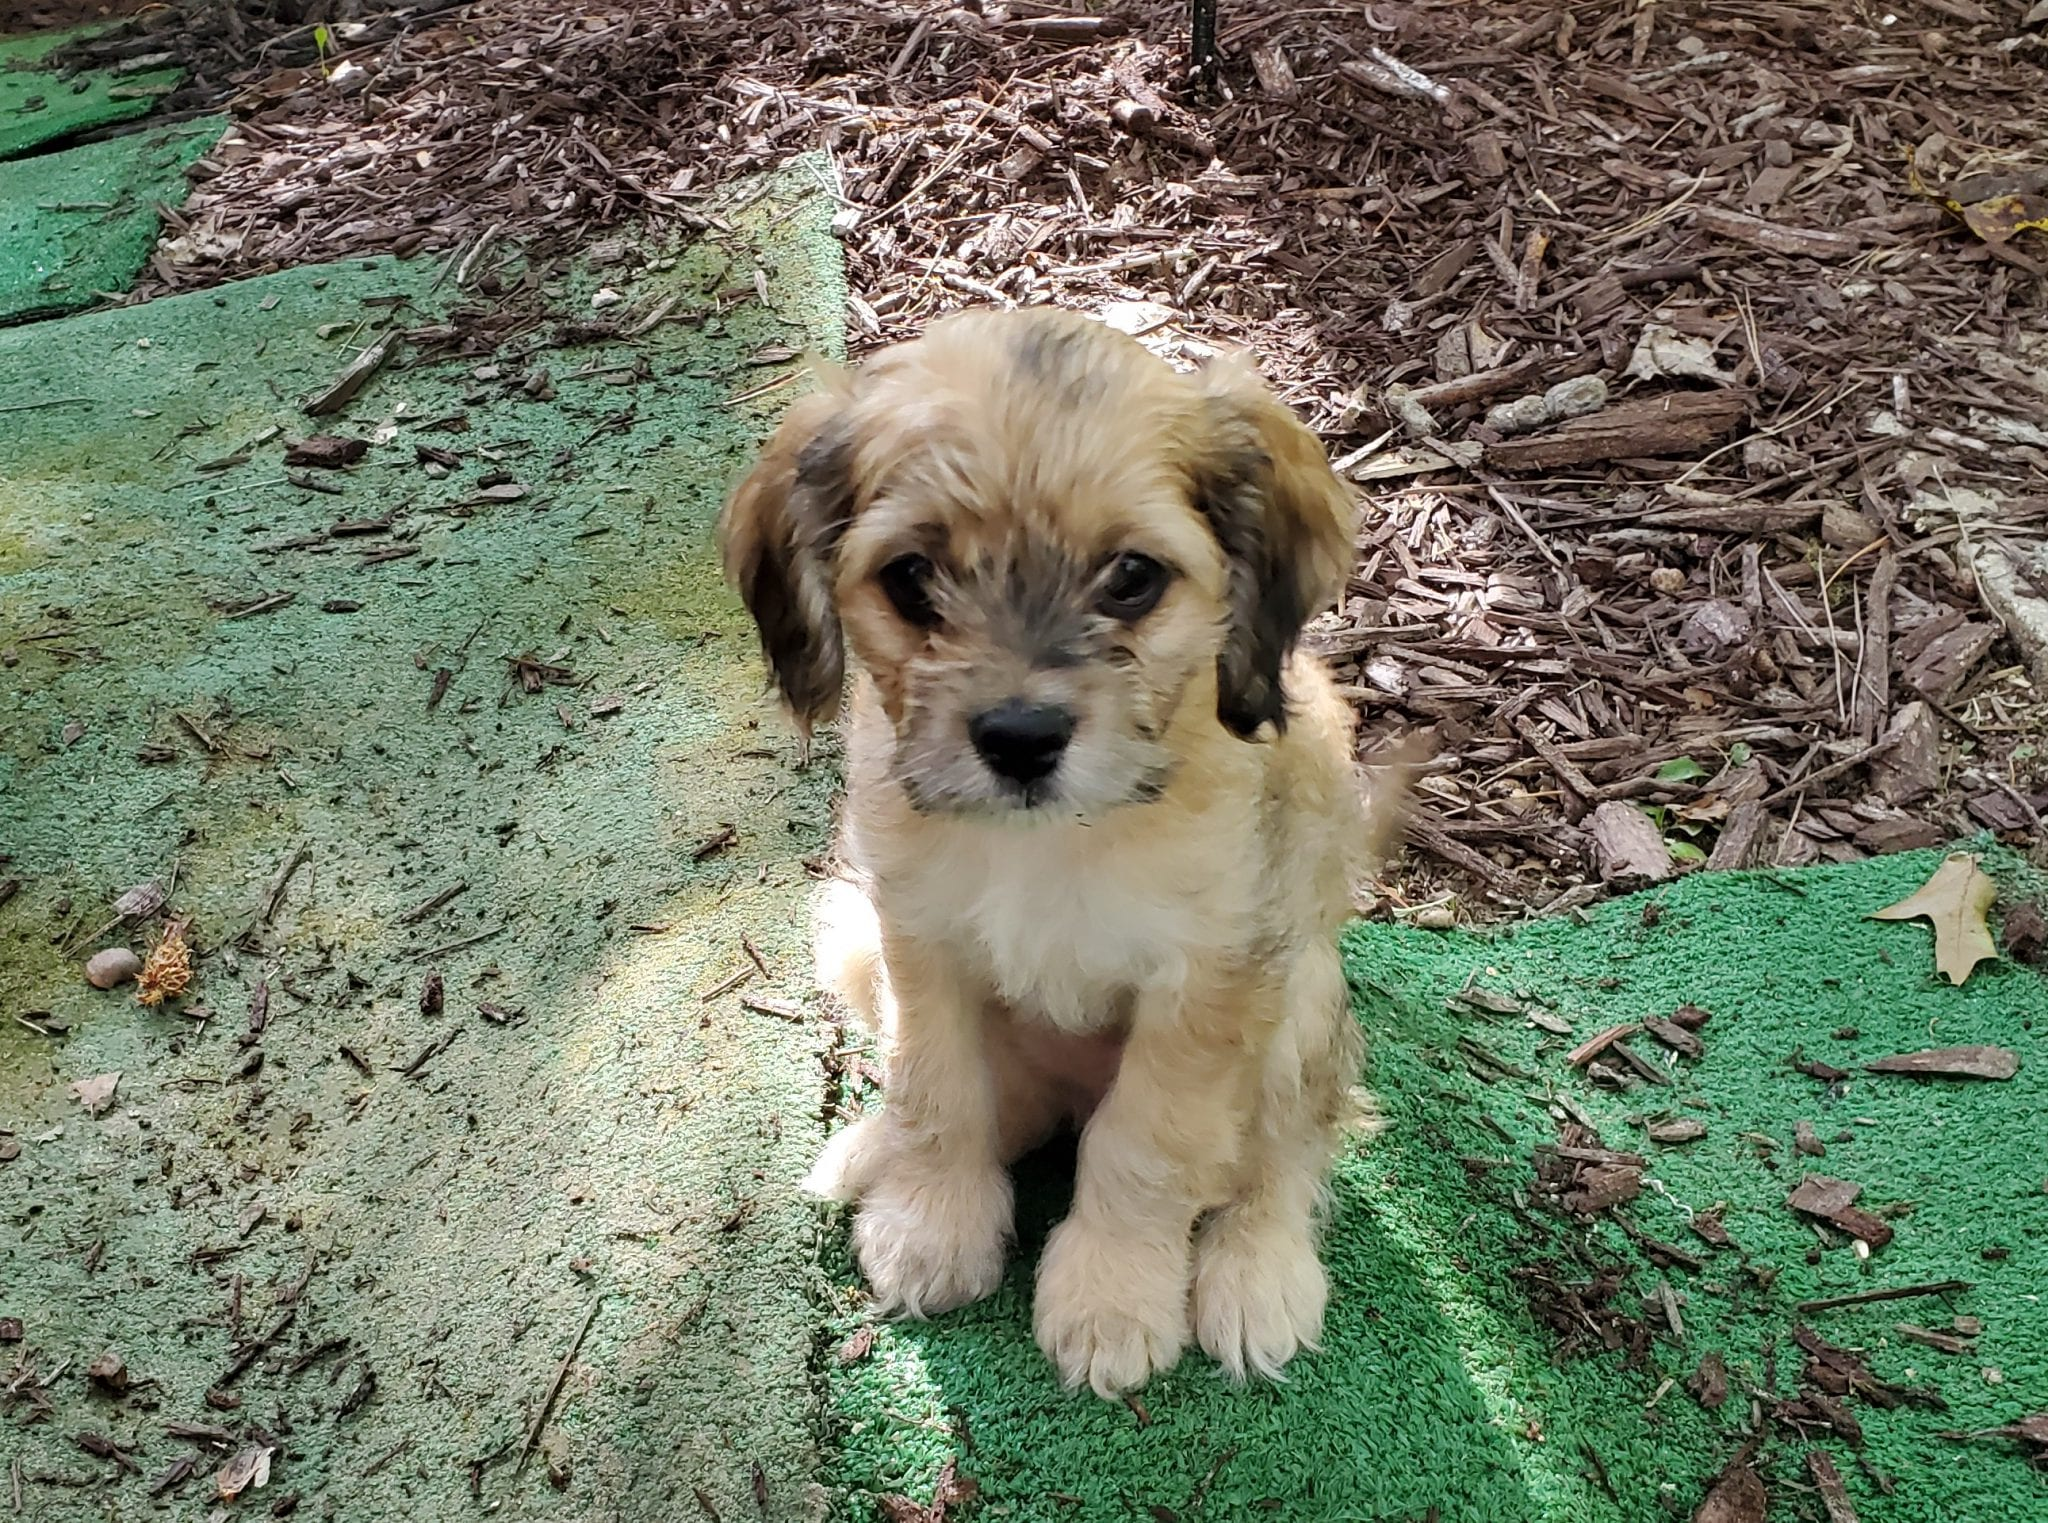 Meet the pet: Dexter, Mocha and Java